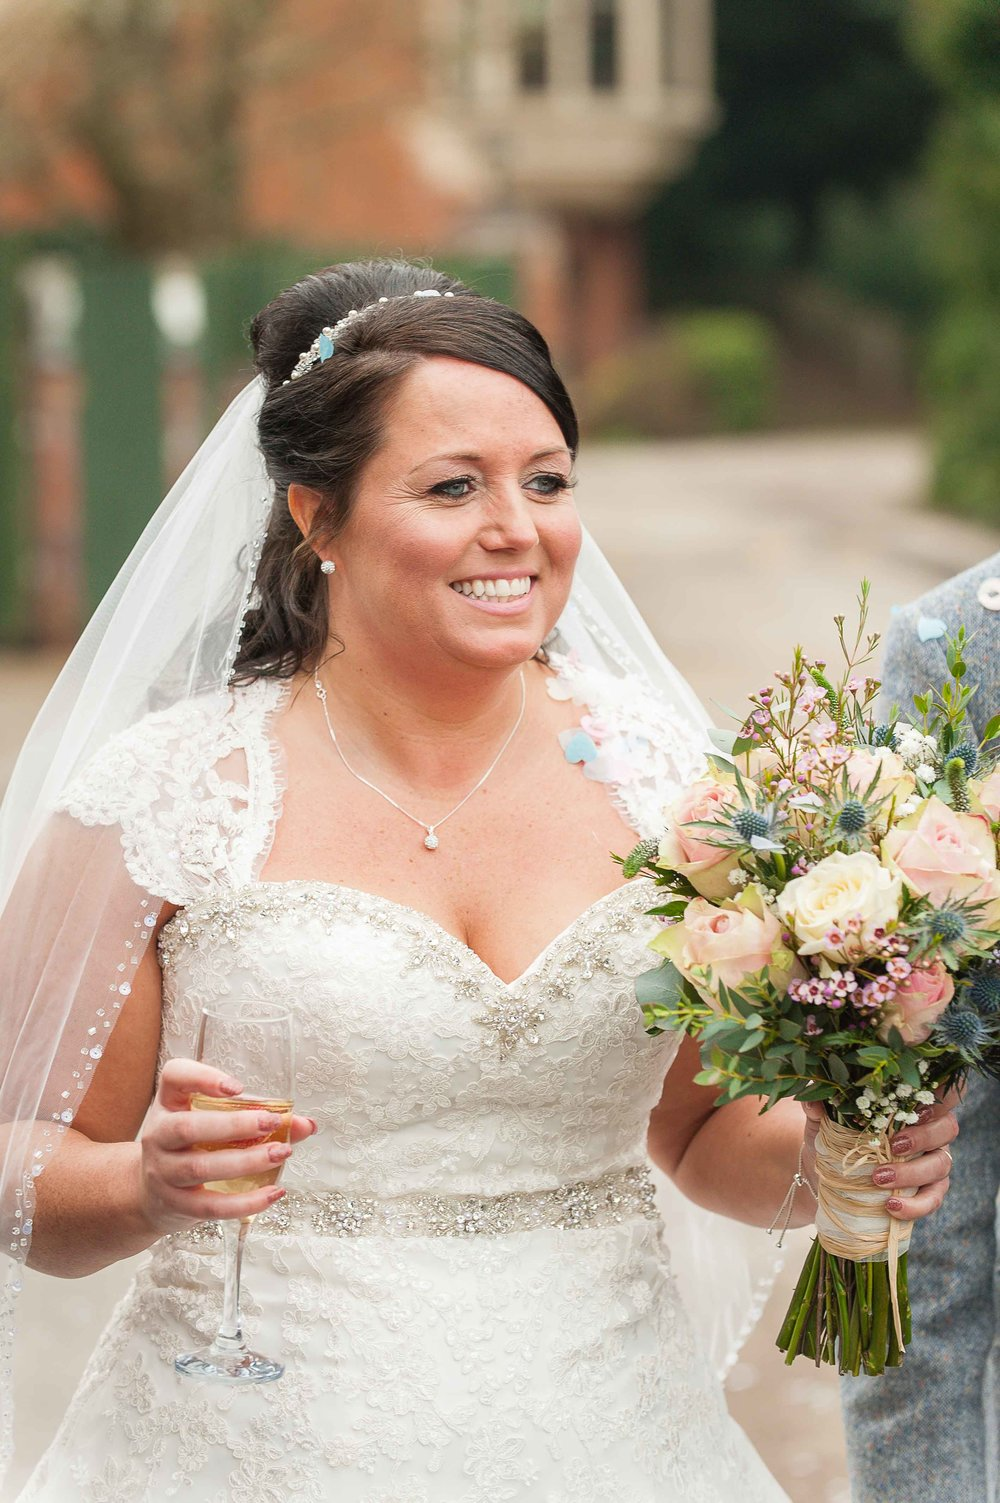 14.02.17 - Matt-Faye-Coombe-Abbey-Valentine-Wedding-Charnwood-Photography-1055.jpg